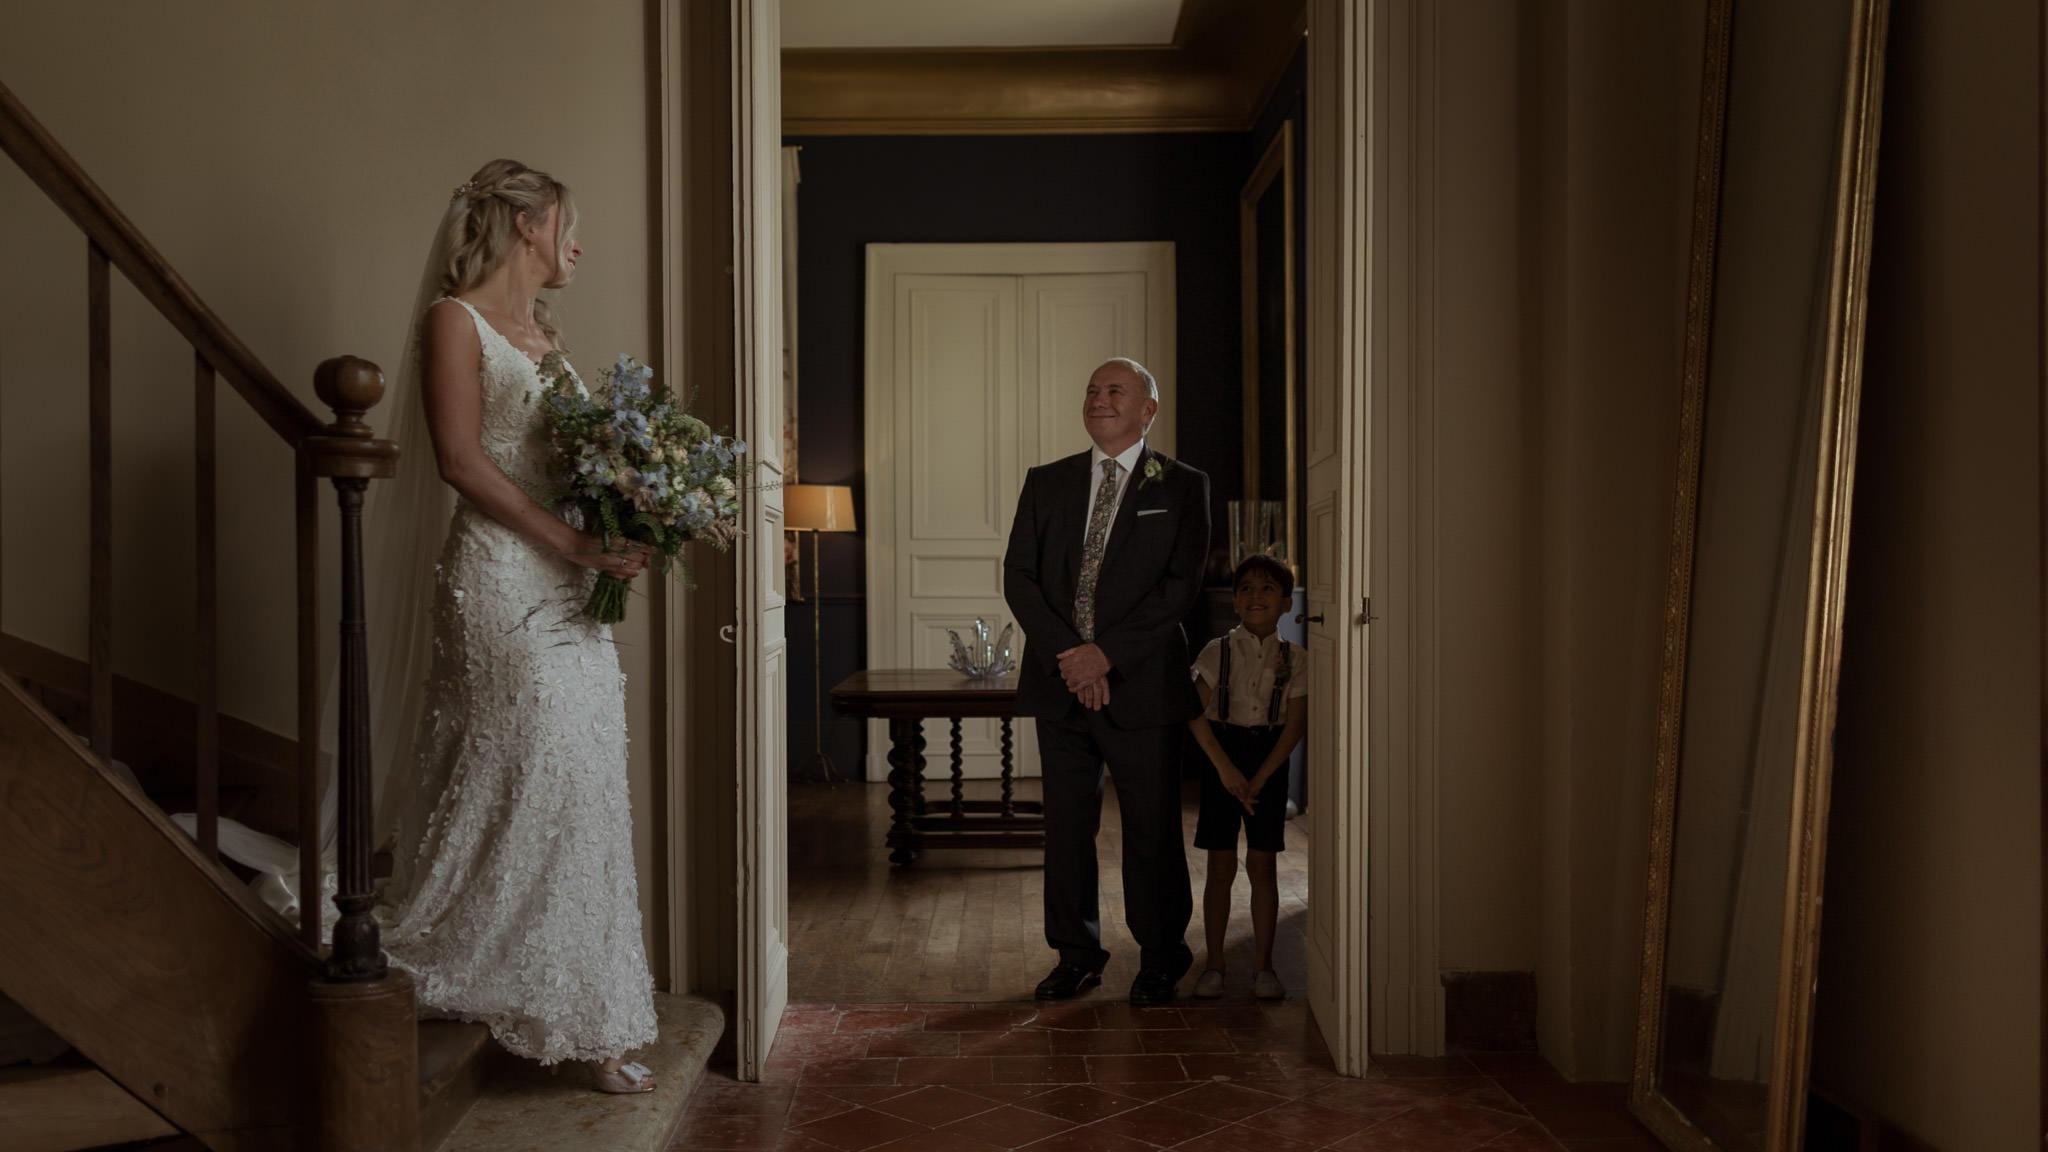 Chateau de Lartigolle Wedding Photographer